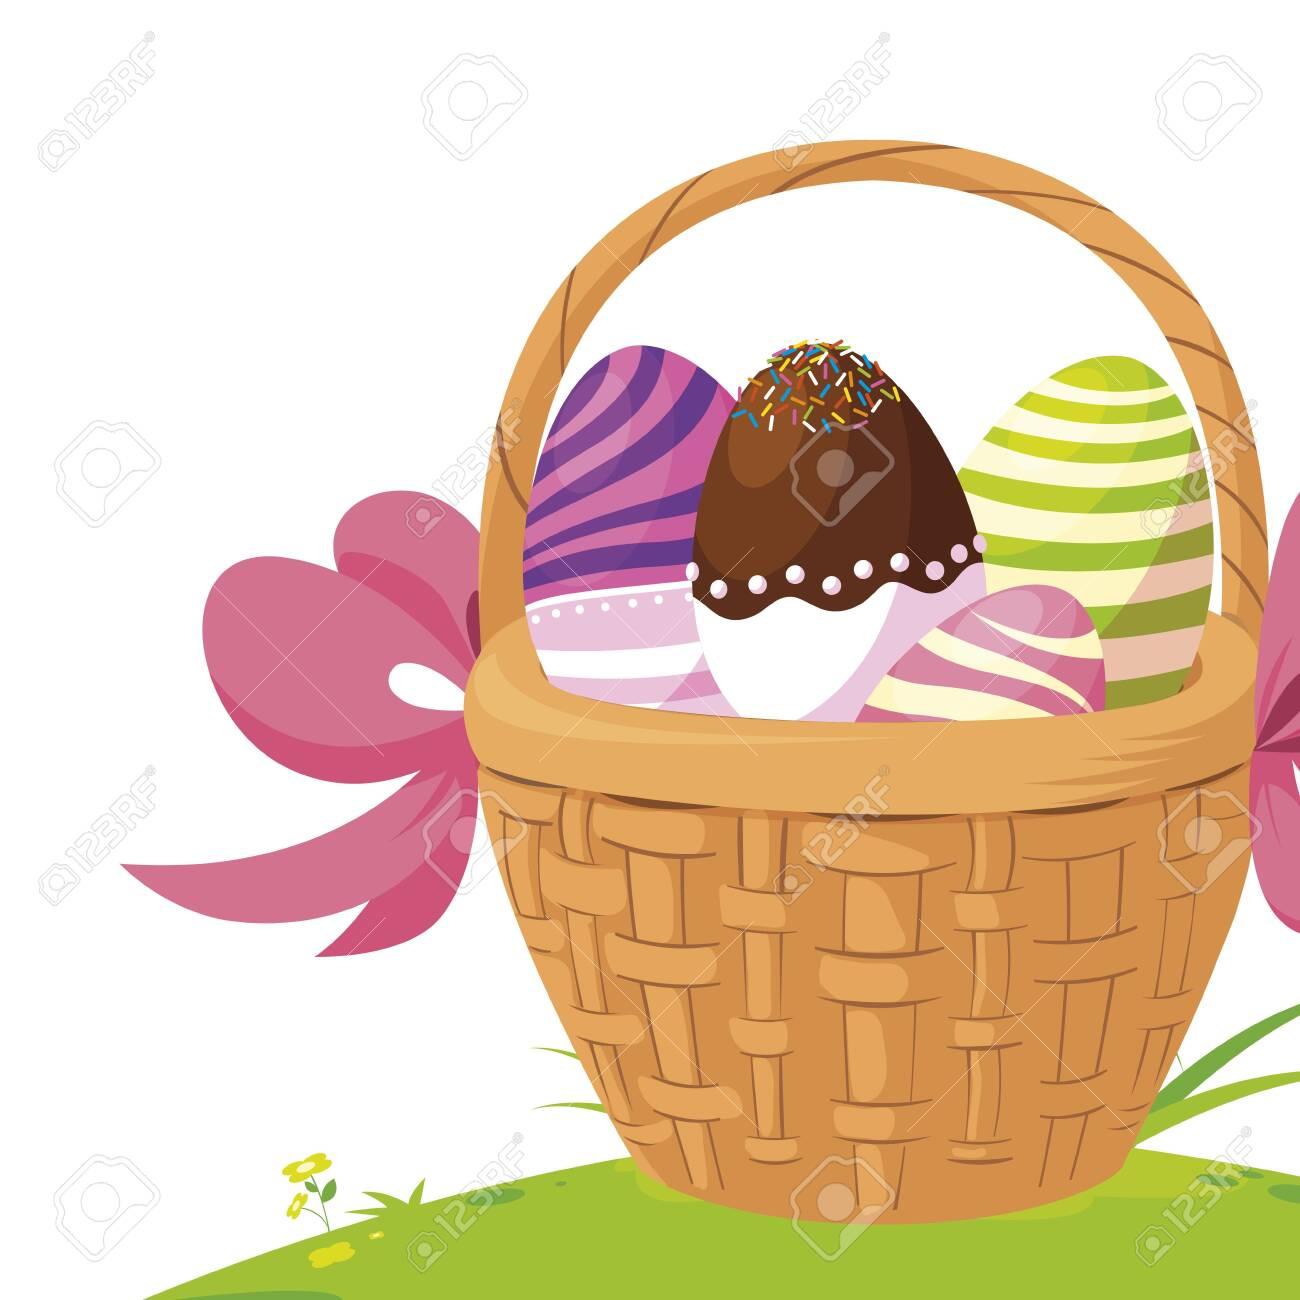 happy easter eggs painted in basket vector illustration design - 122846541